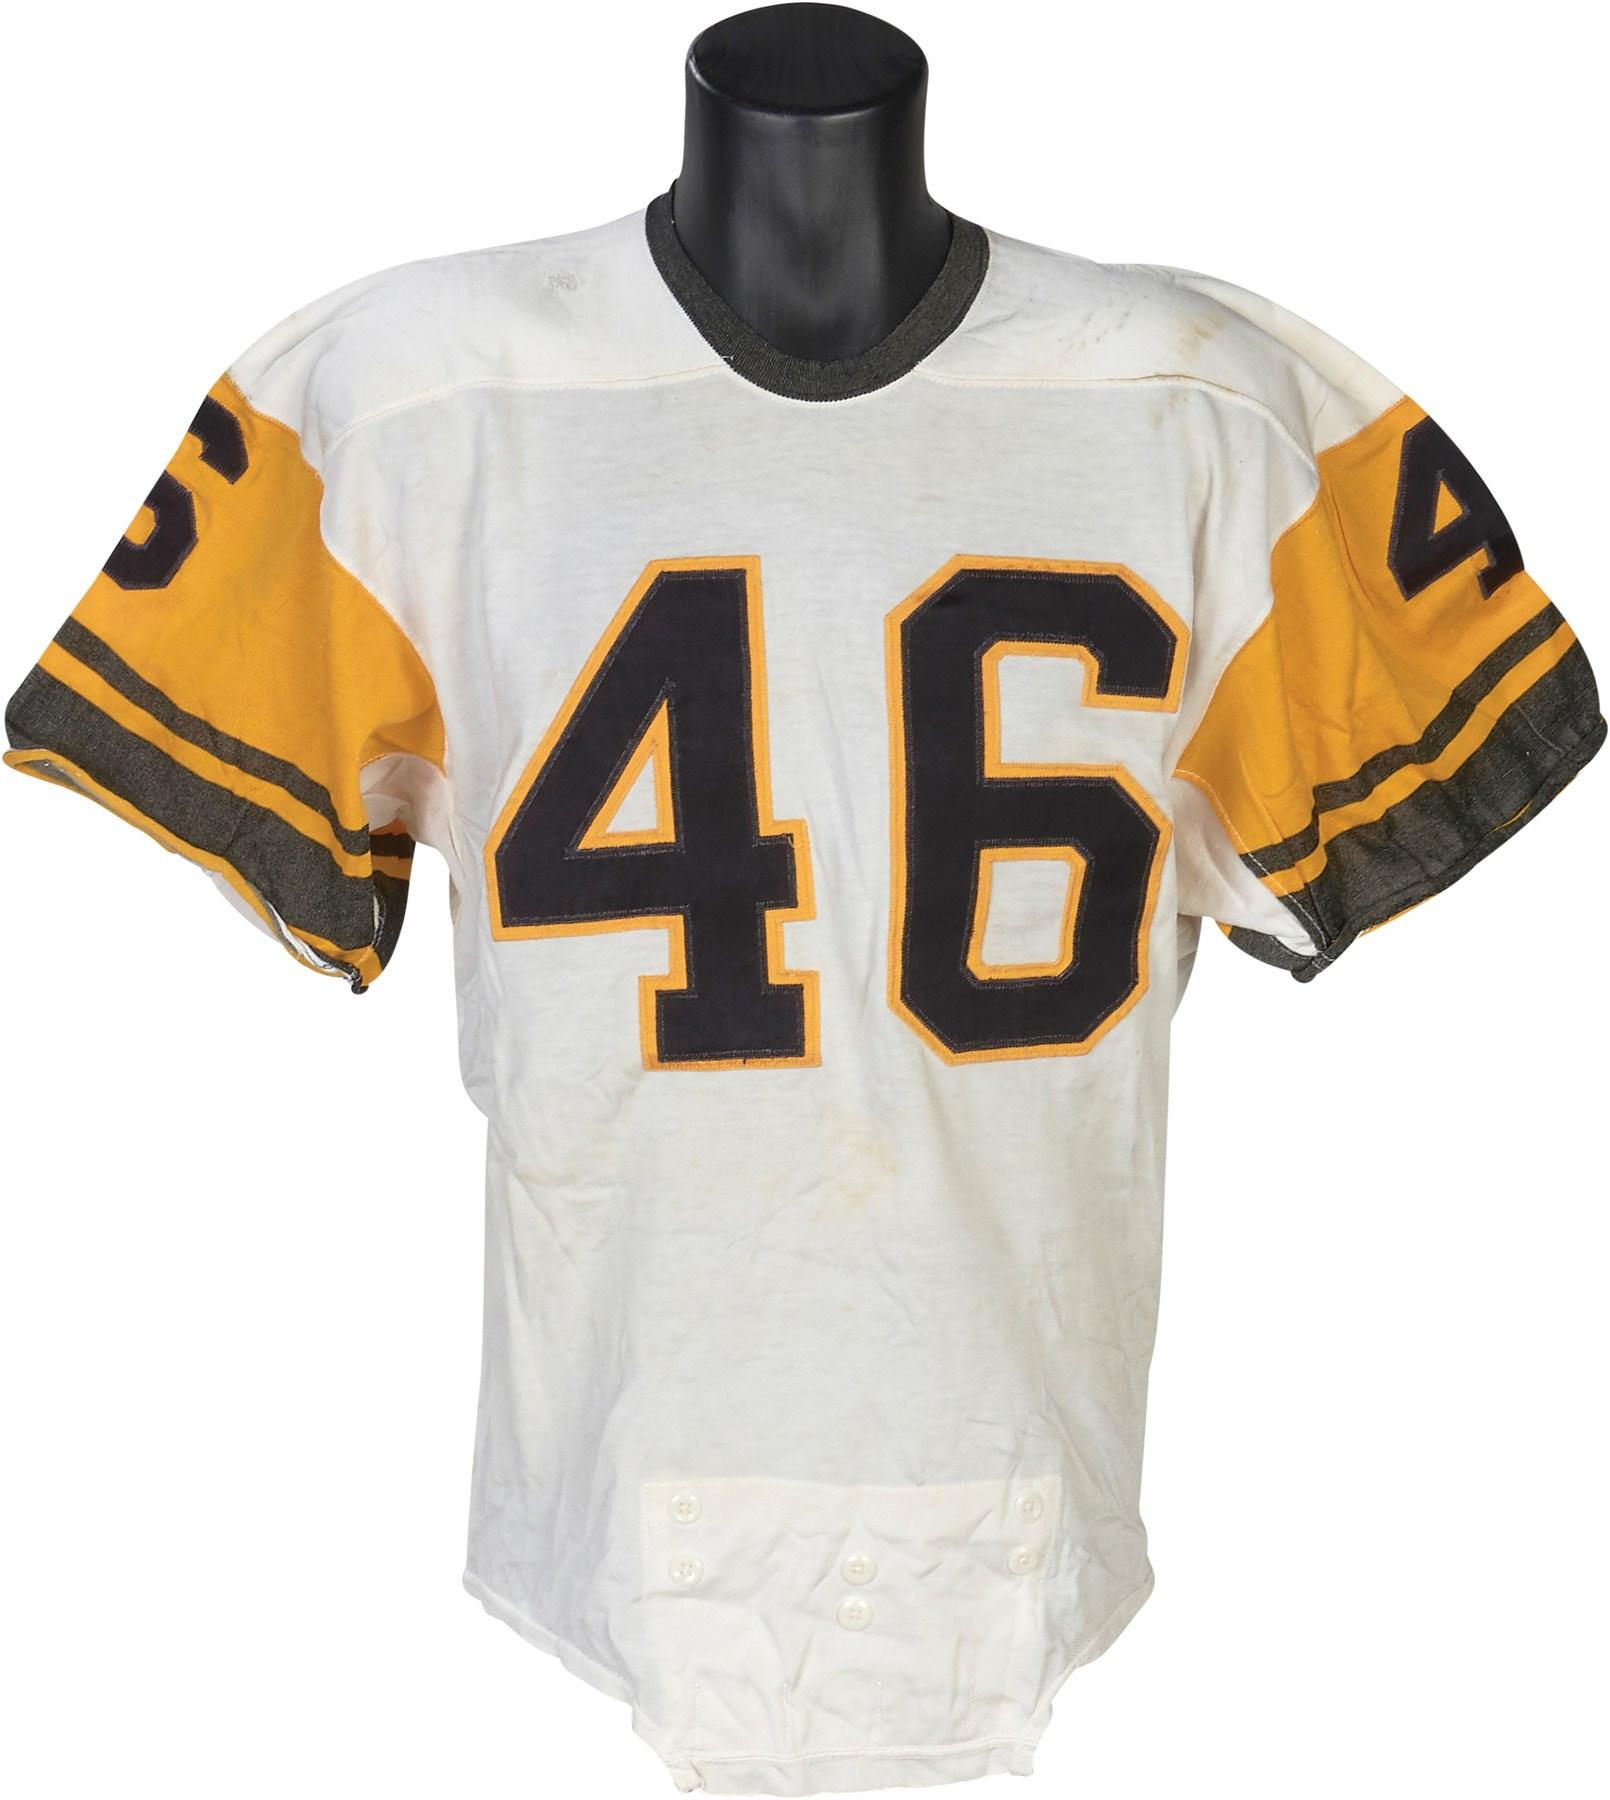 e0f24c5e9c7 1962-63 Bob Ferguson Pittsburgh Steelers Game Worn Jersey